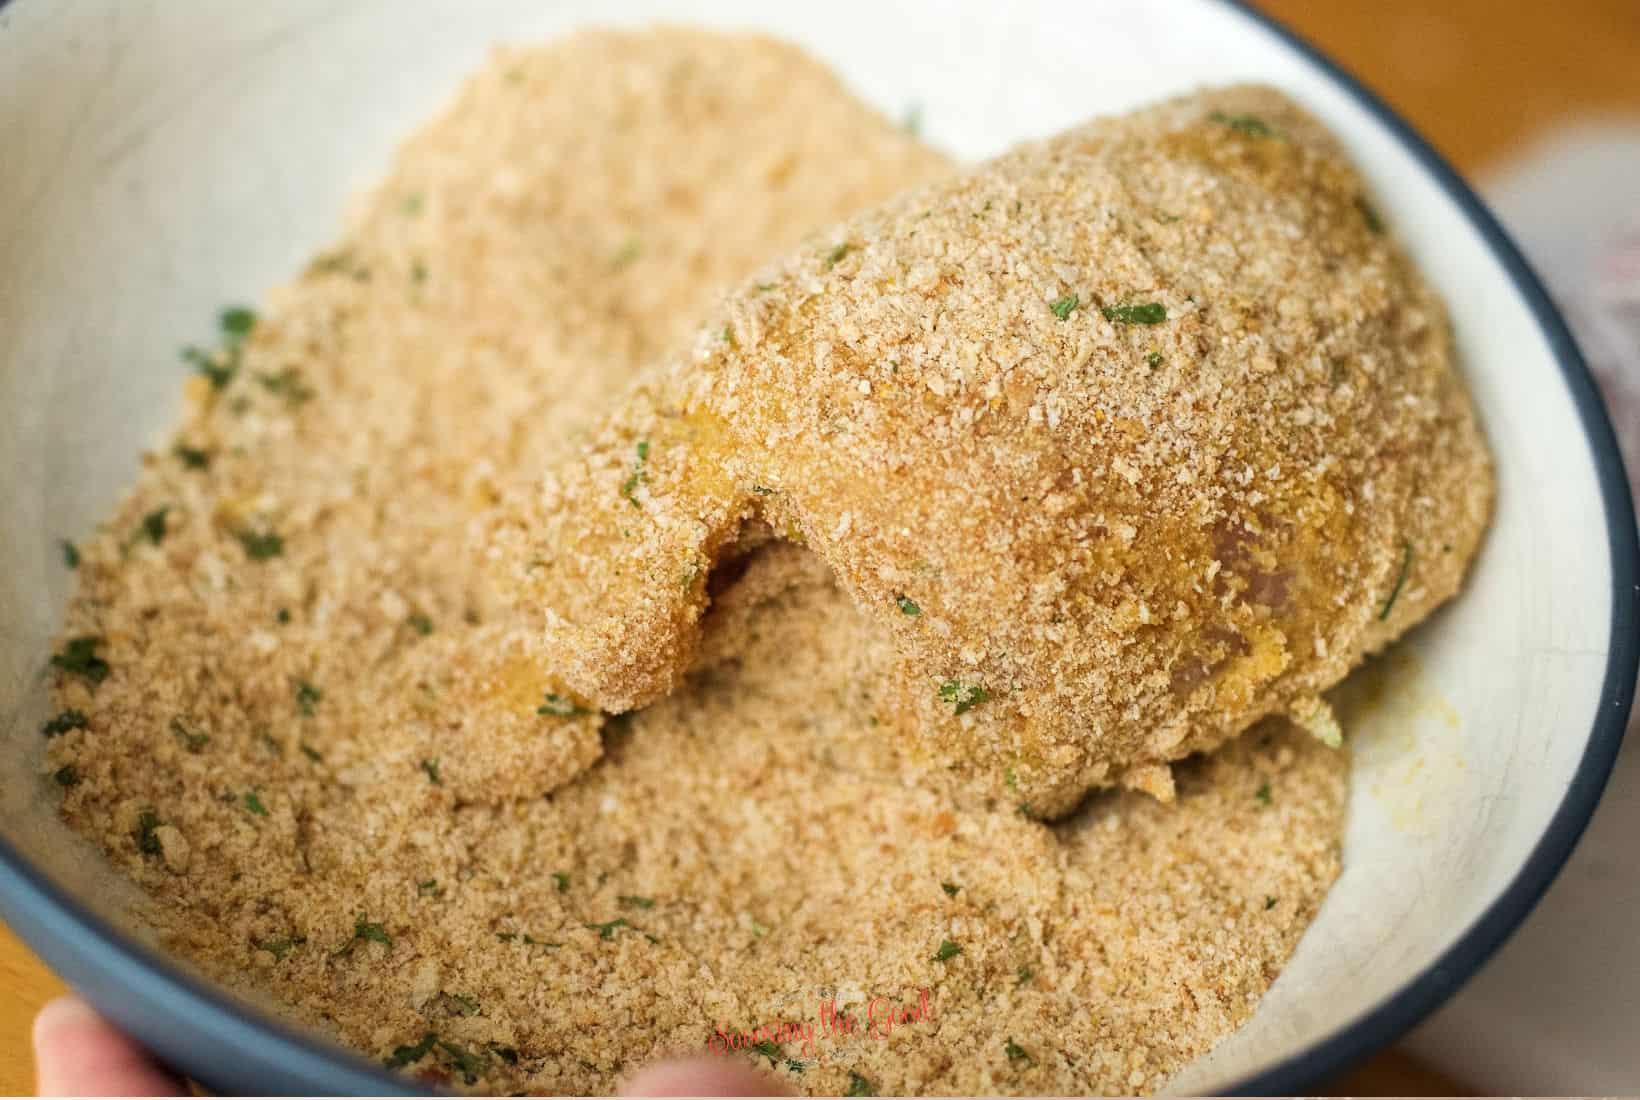 bread crumb dredged chicken cordon bleu